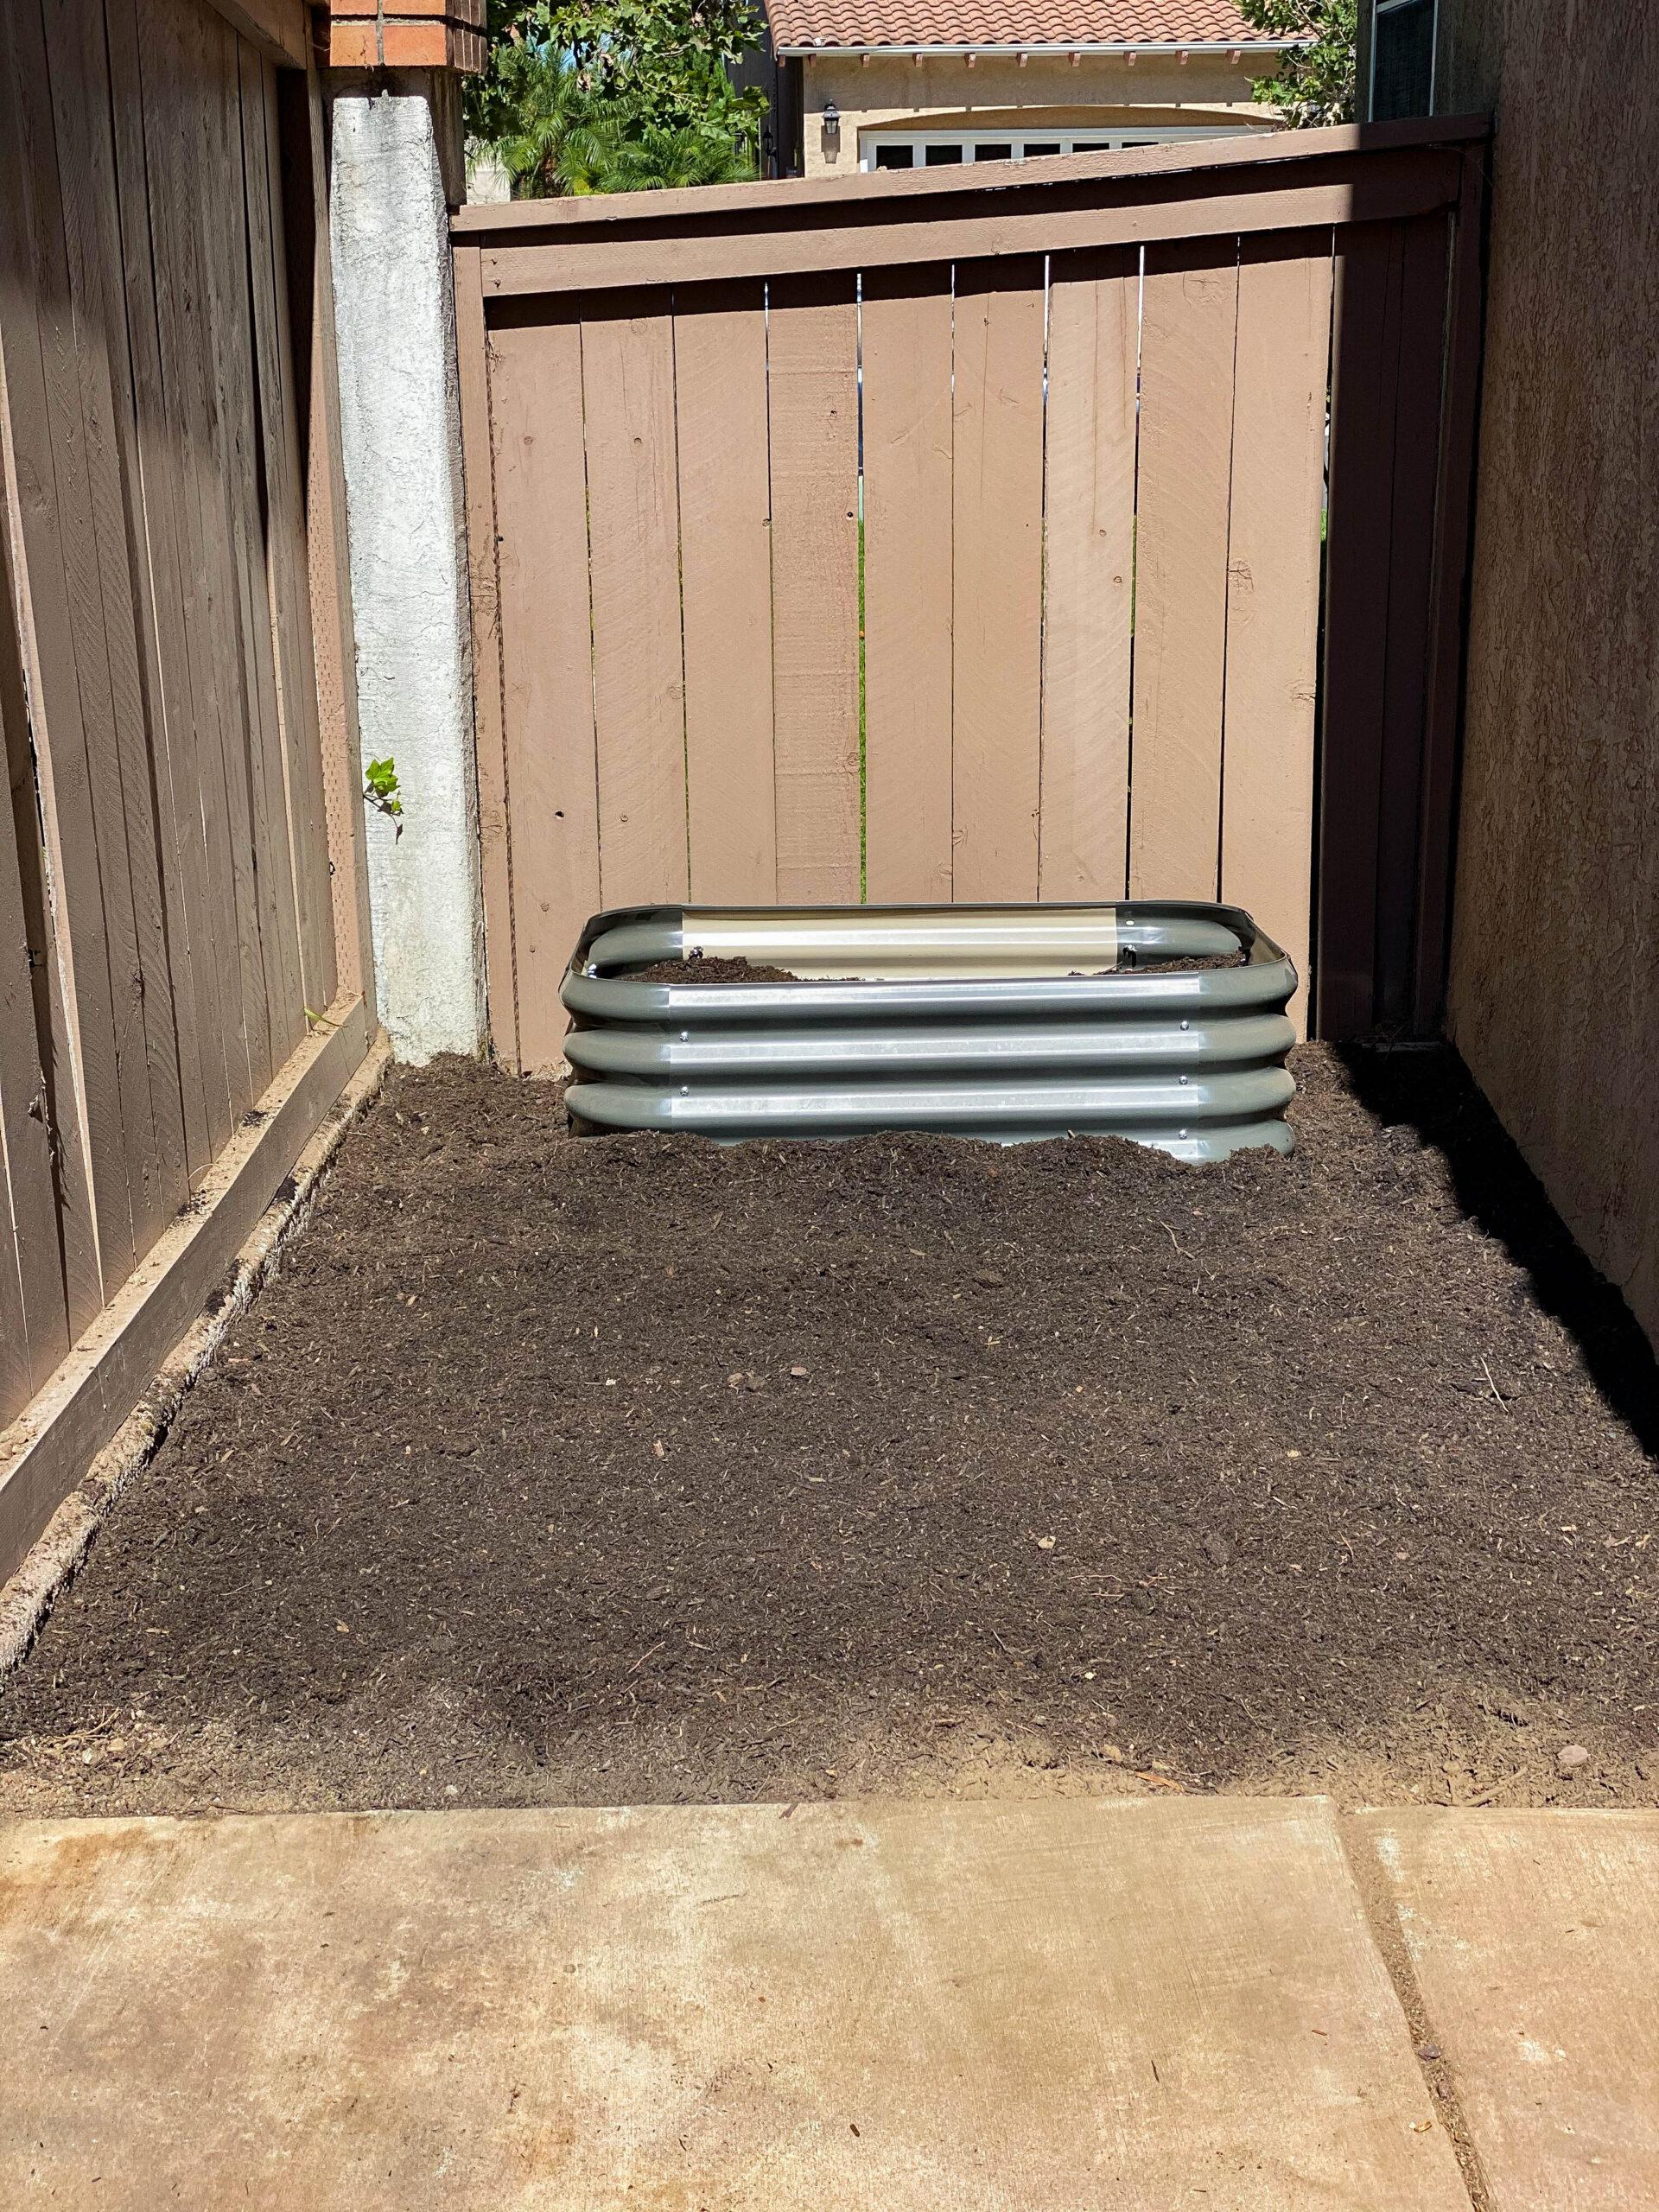 Garden Soil Preparation: After